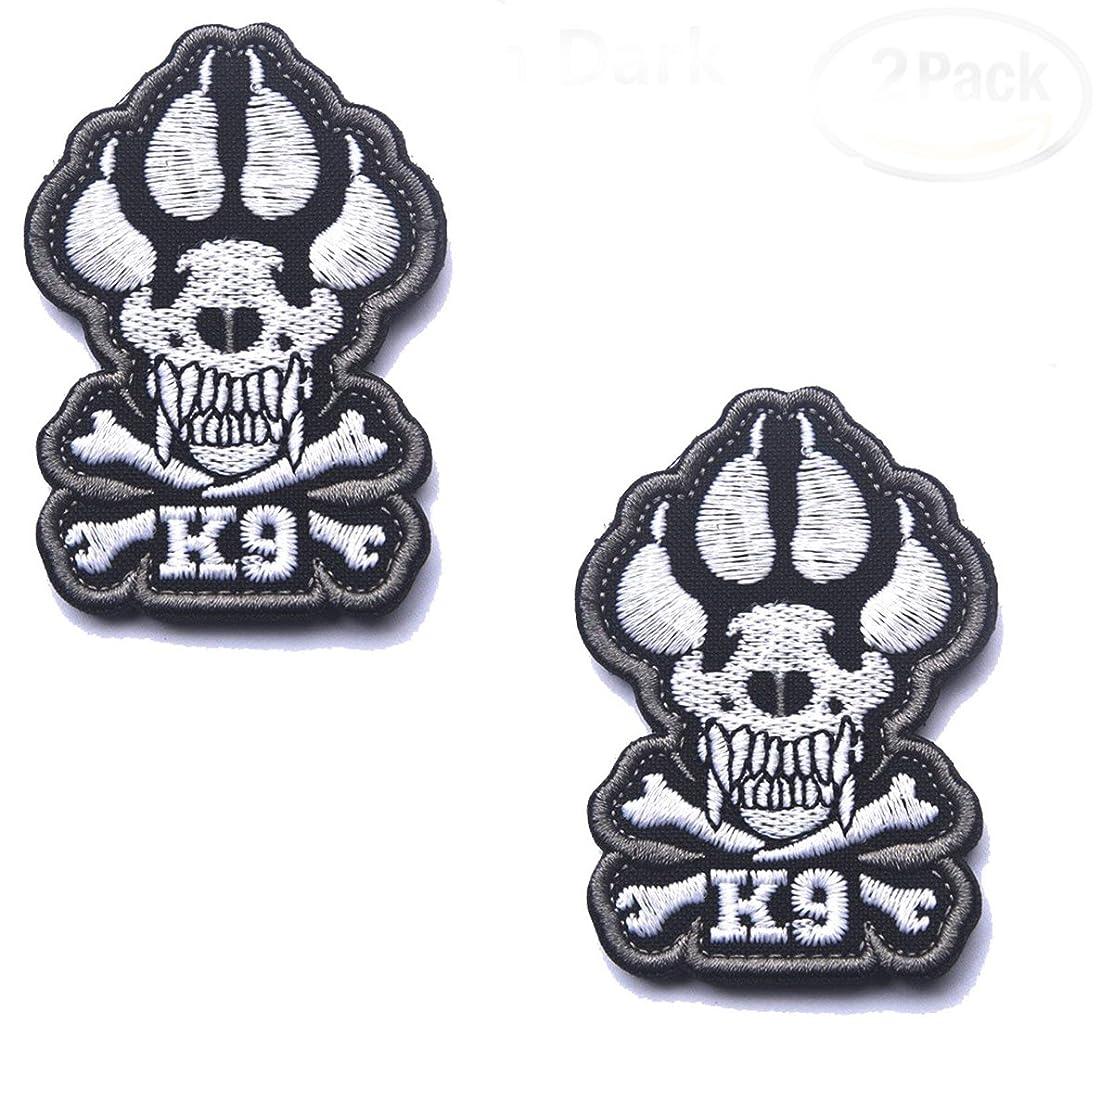 K9 Crossbones Killer Attack Police Dog Patch Embroidered Army SWAT Military Tactical Morale Badge Emblem Embroidered Fastener Hook & Loop Patch for Pet Harnesses Vest (2PCS)